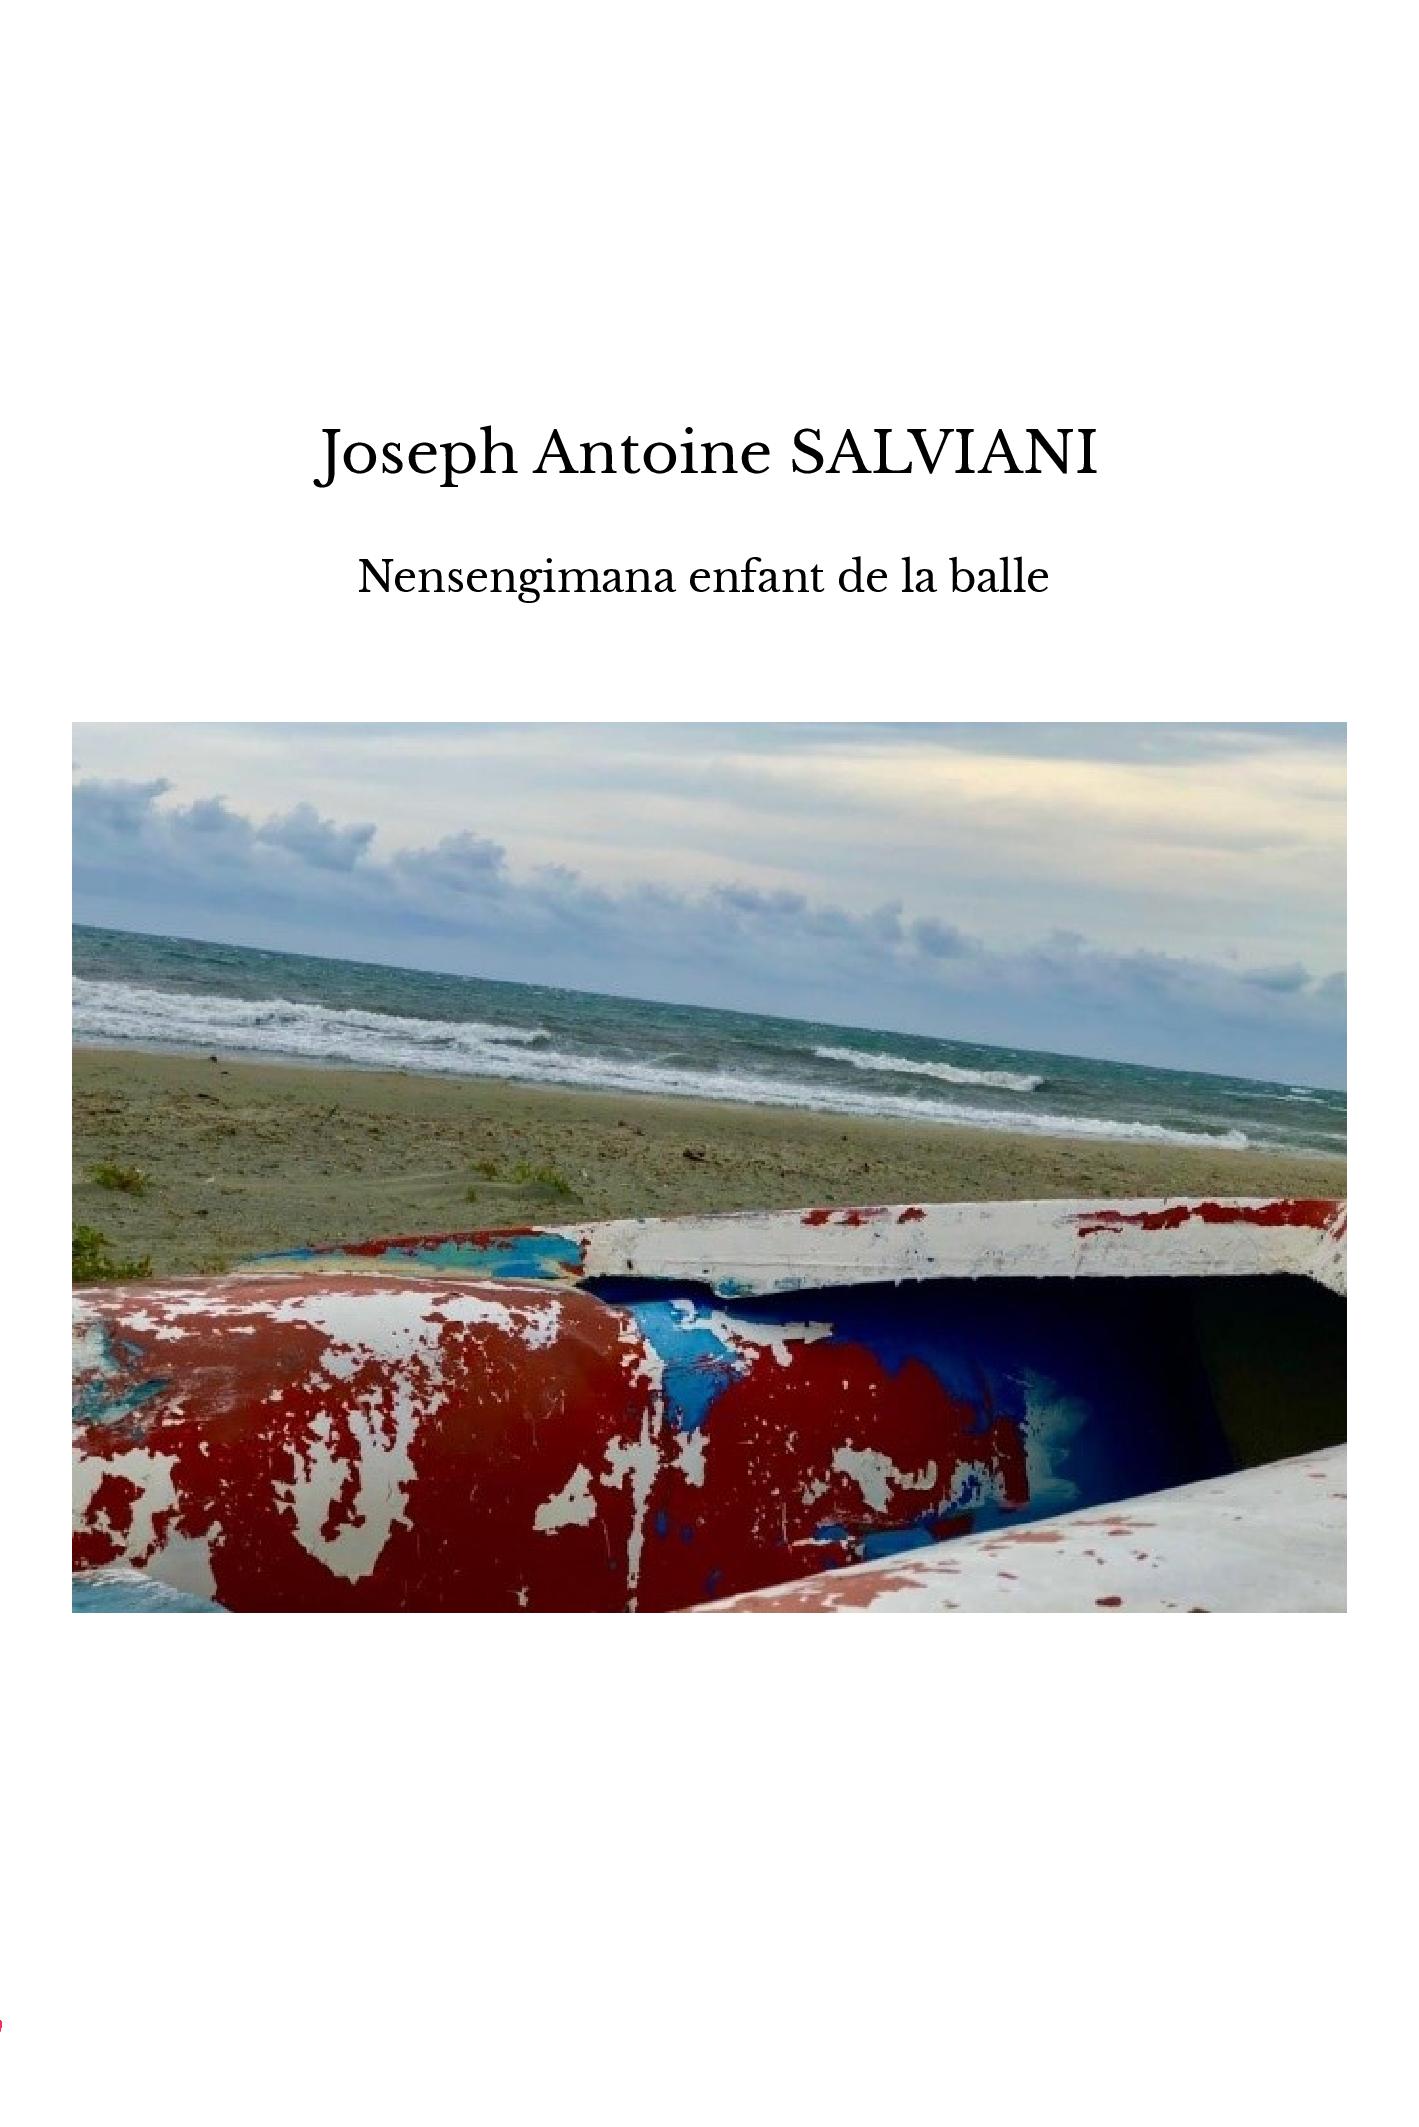 Joseph Antoine SALVIANI